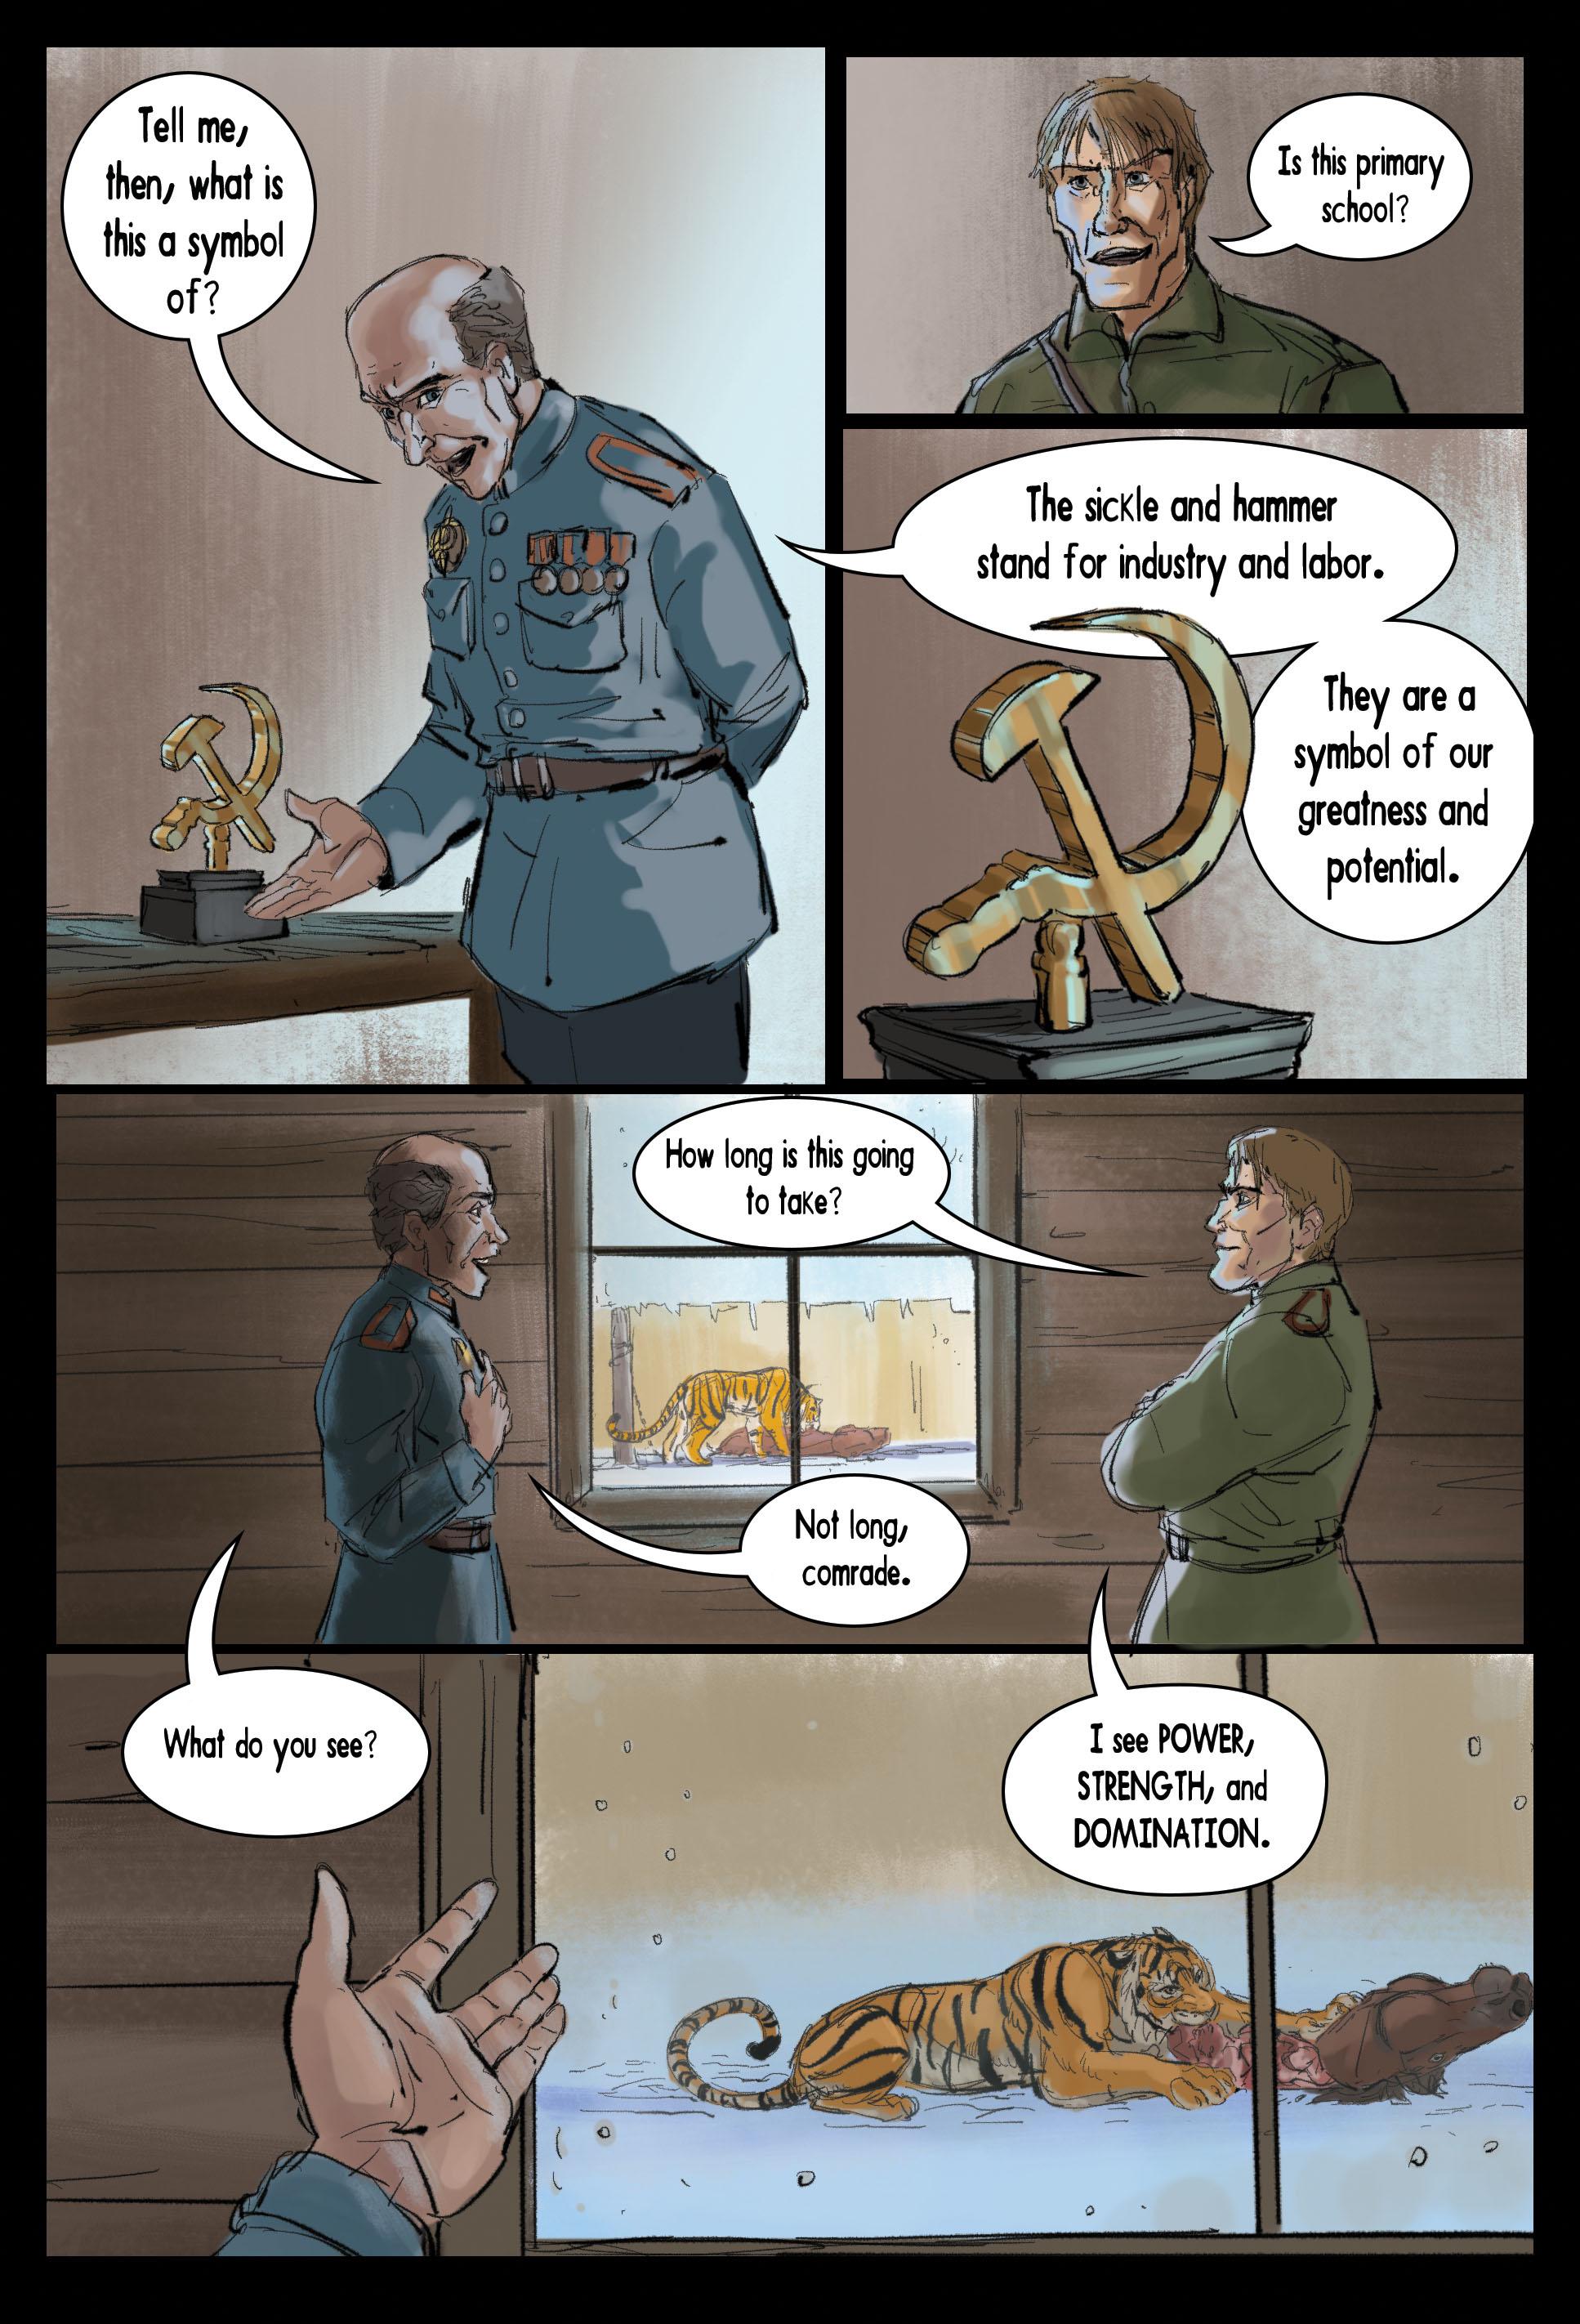 Gulag_Web149.jpg